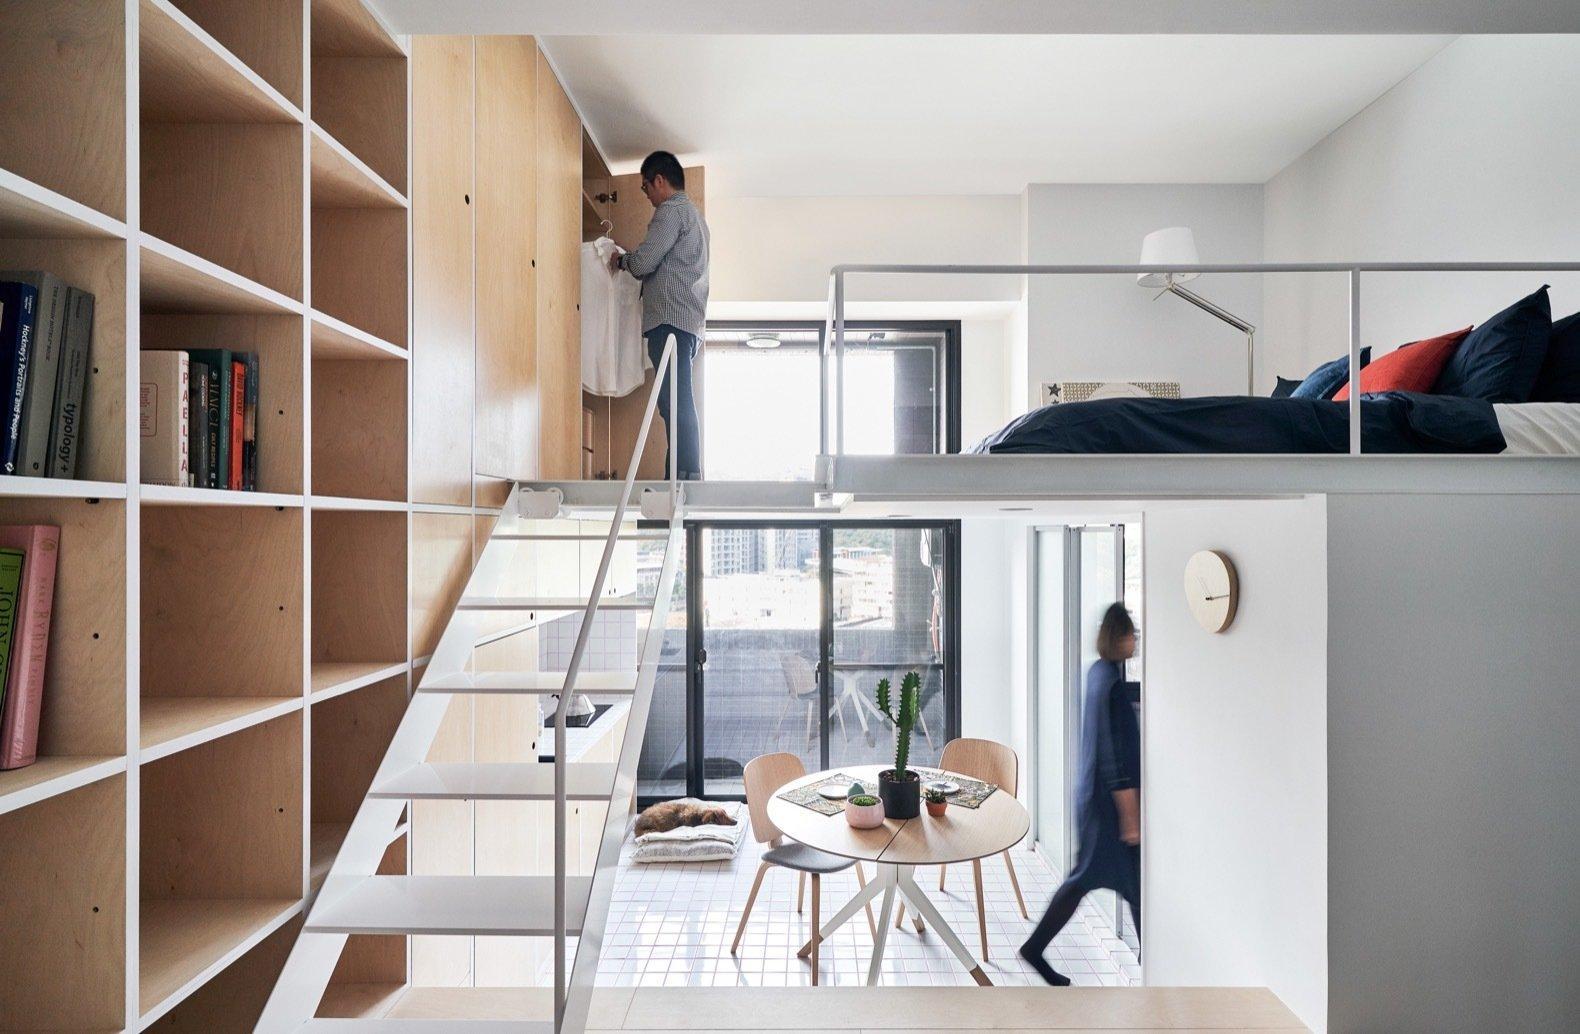 muji apartment